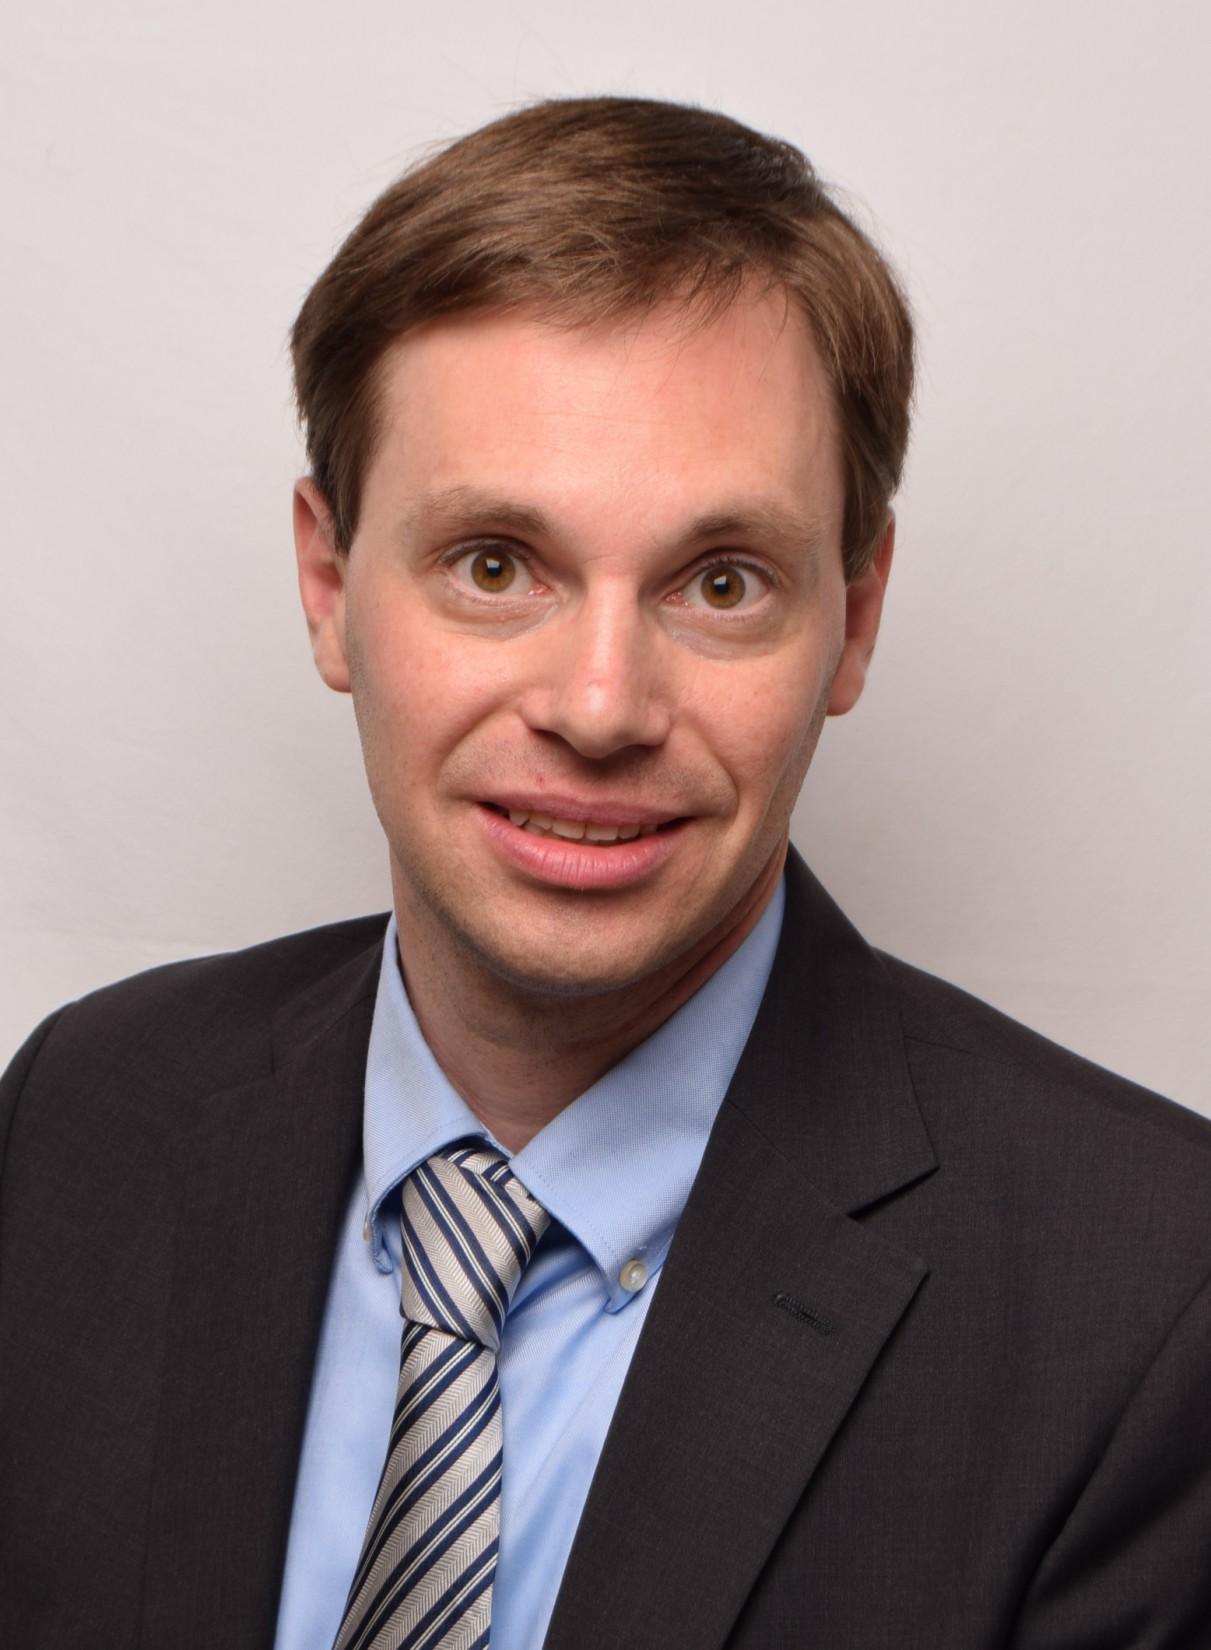 Mag. Benedikt Gamillscheg